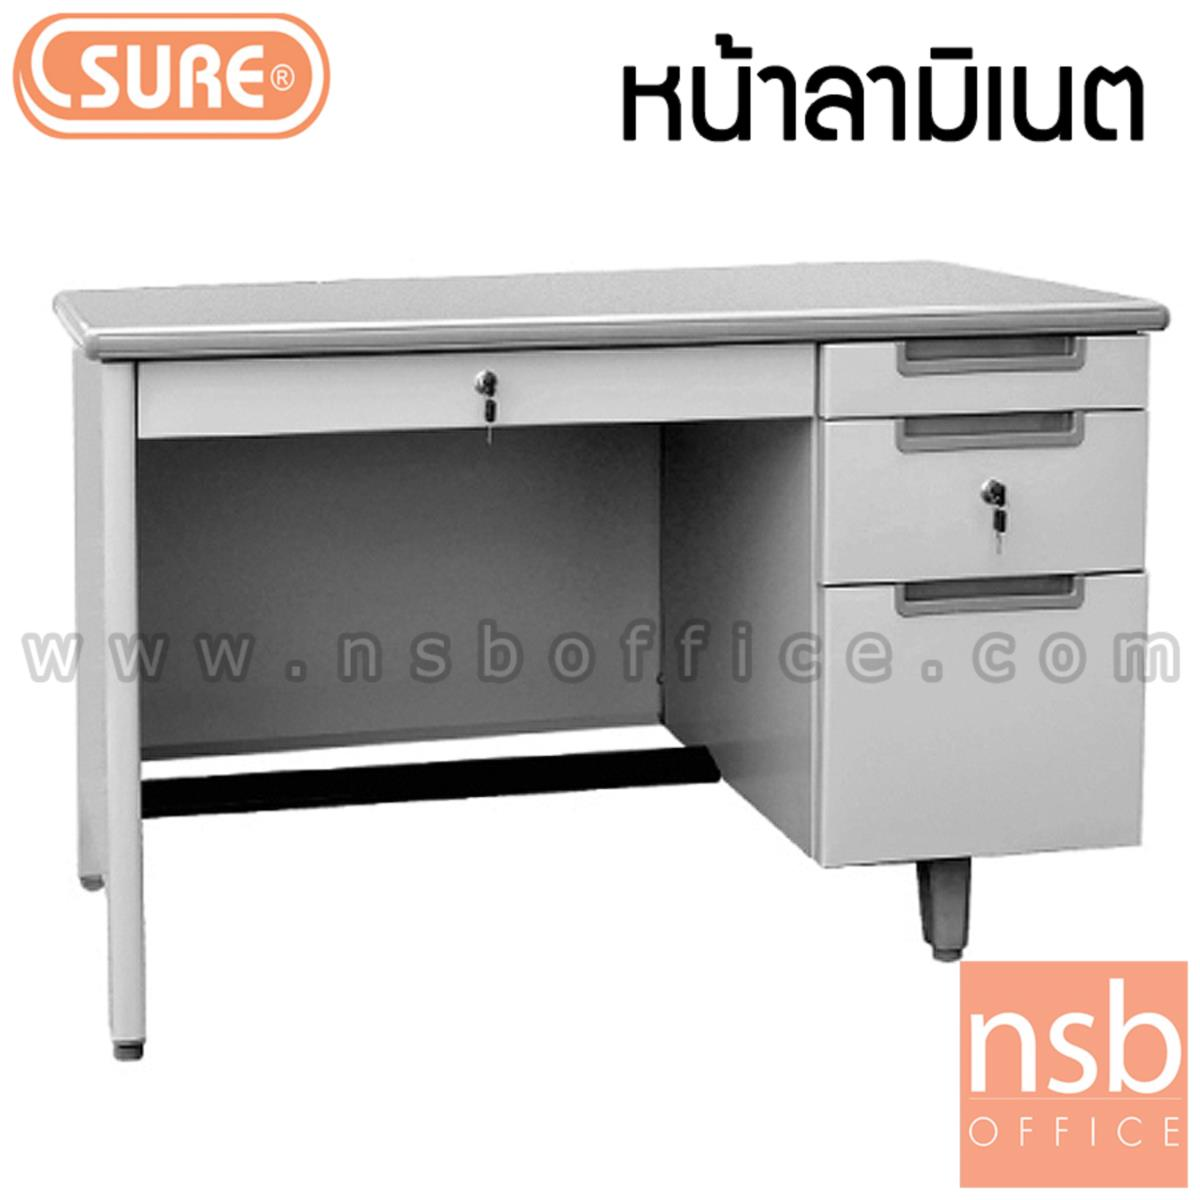 E04A002:โต๊ะทำงานเหล็ก หน้าลามิเนต 4 ลิ้นชัก (ขนาด 3.5 และ 4 ฟุต) รุ่น MT-2642,MT-2648